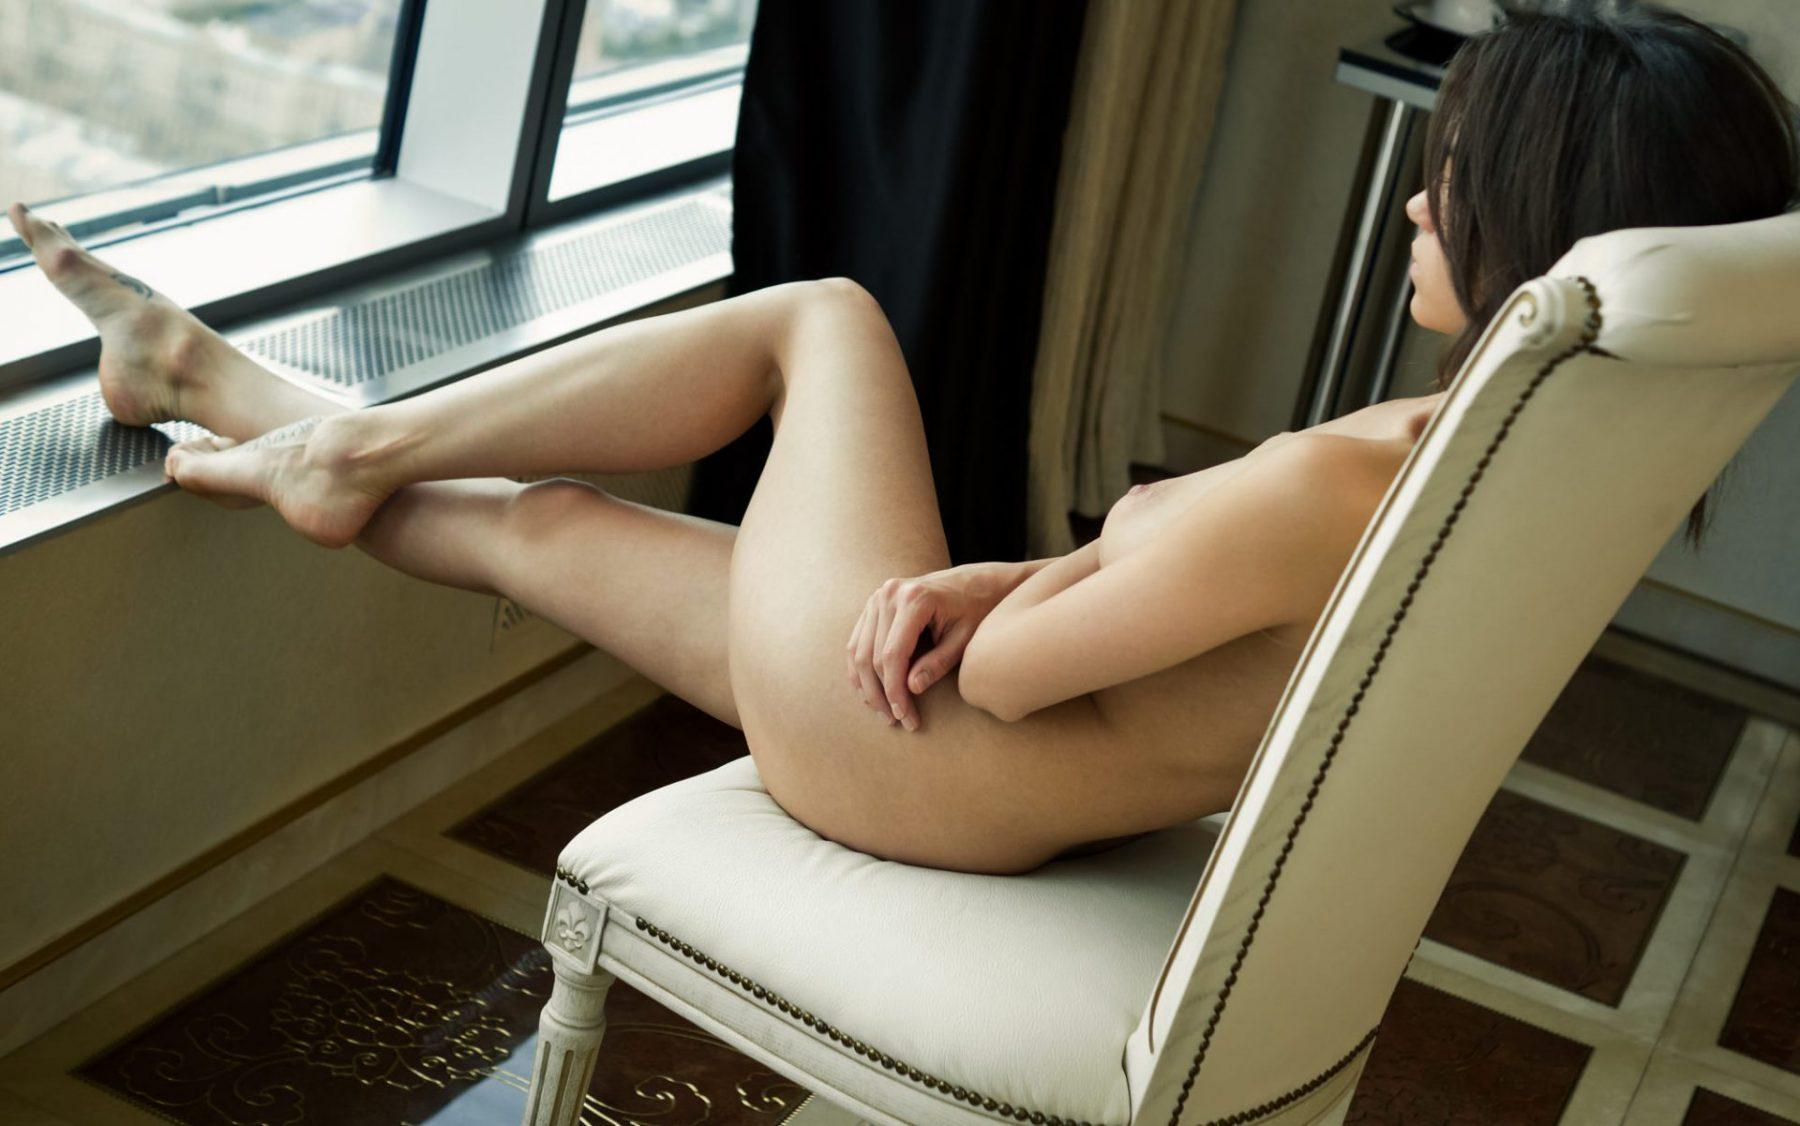 Sensual Maria Demina Nude Russian Model Photos  4FAPNET